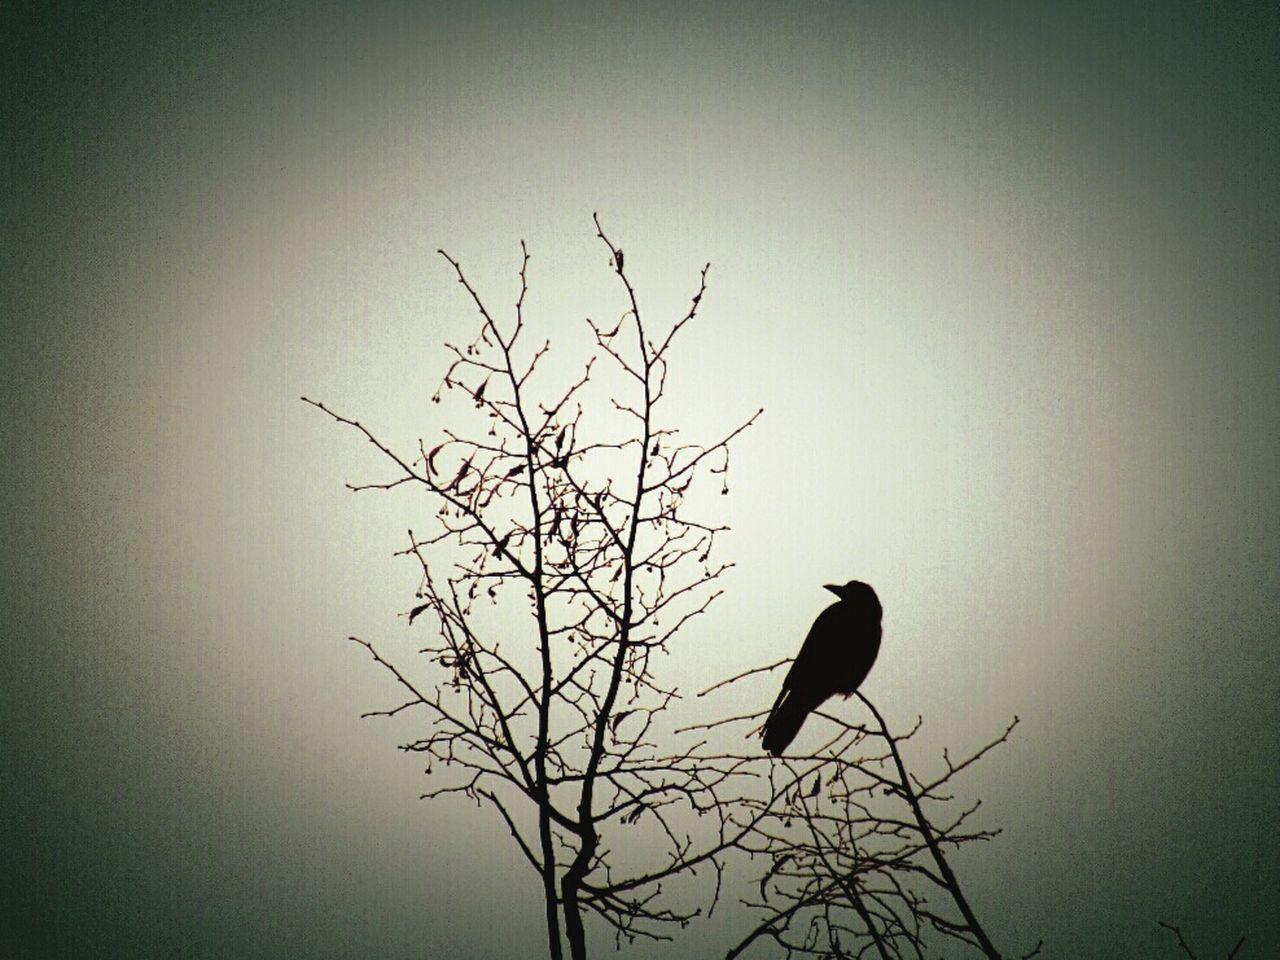 I Love Birds Bird Nature Crow Birds EyeEm Nature Lover Eyeemphotography Beautiful Light Minimalism Autumn Bird Photography EyeEm Gallery Rook Exceptional Photographs